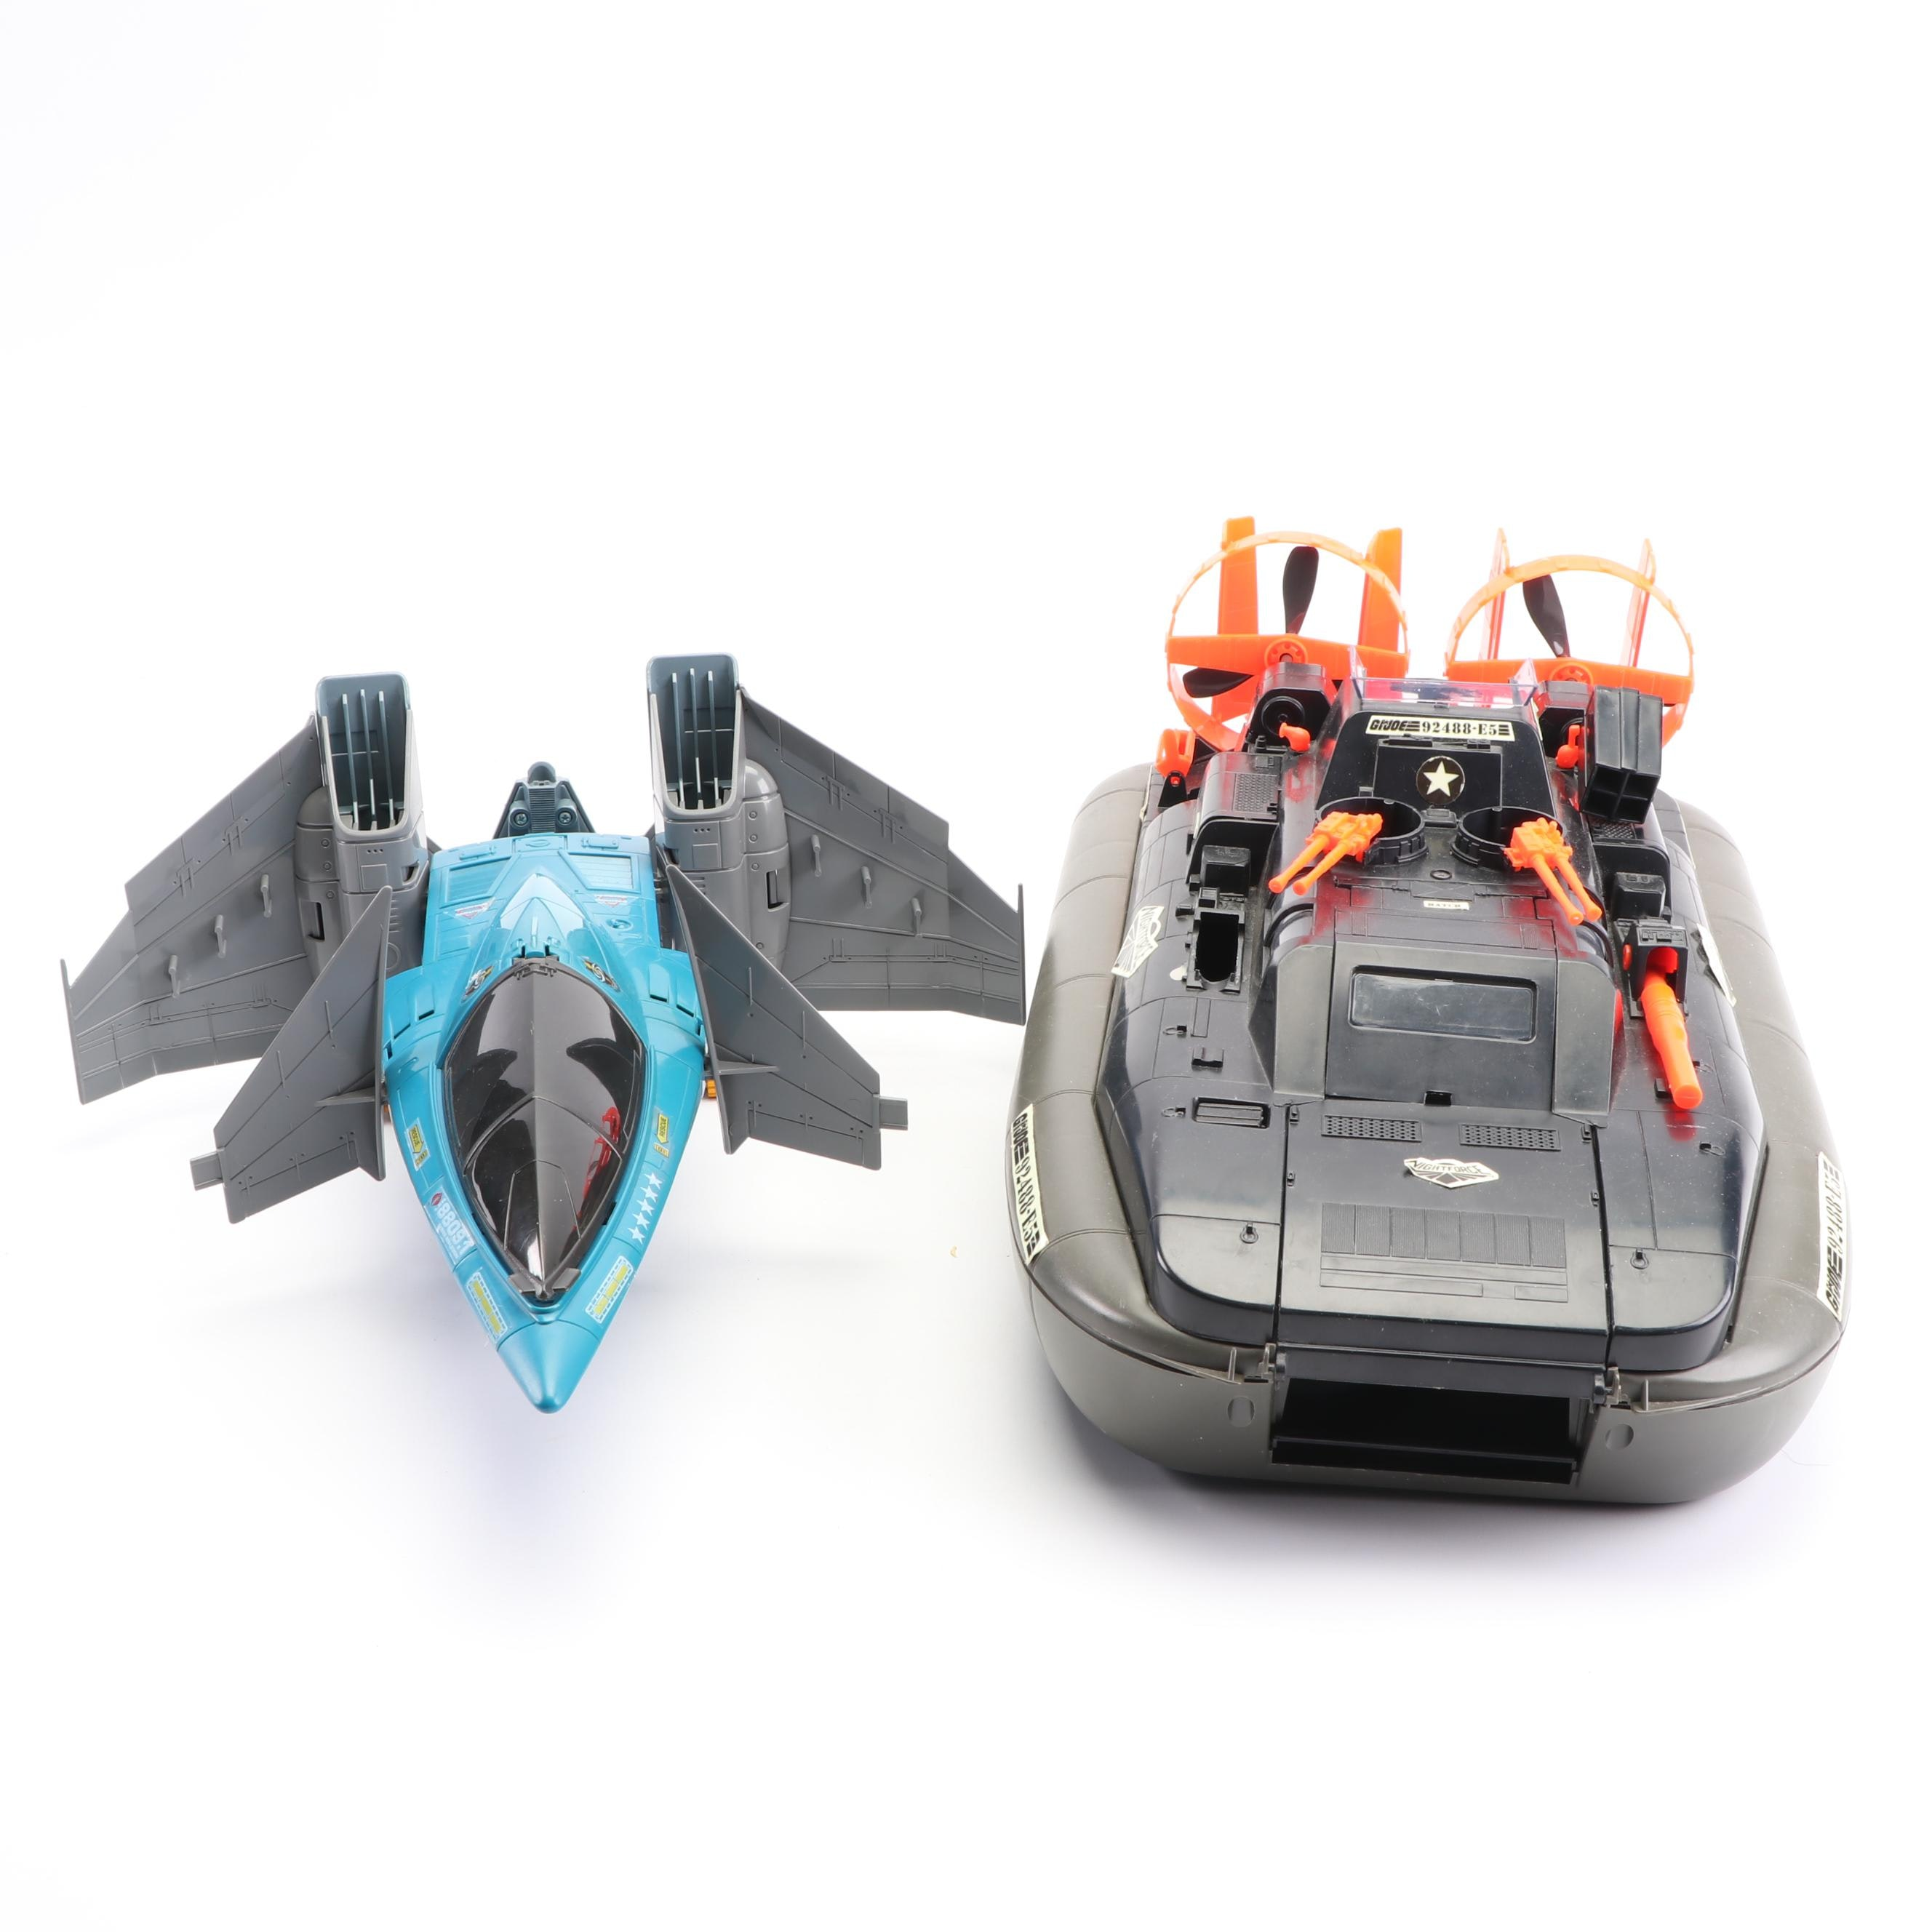 G.I. Joe 92488-E5 Night Striker and LER 8809.1 Cobra Air-Legion Action Toys